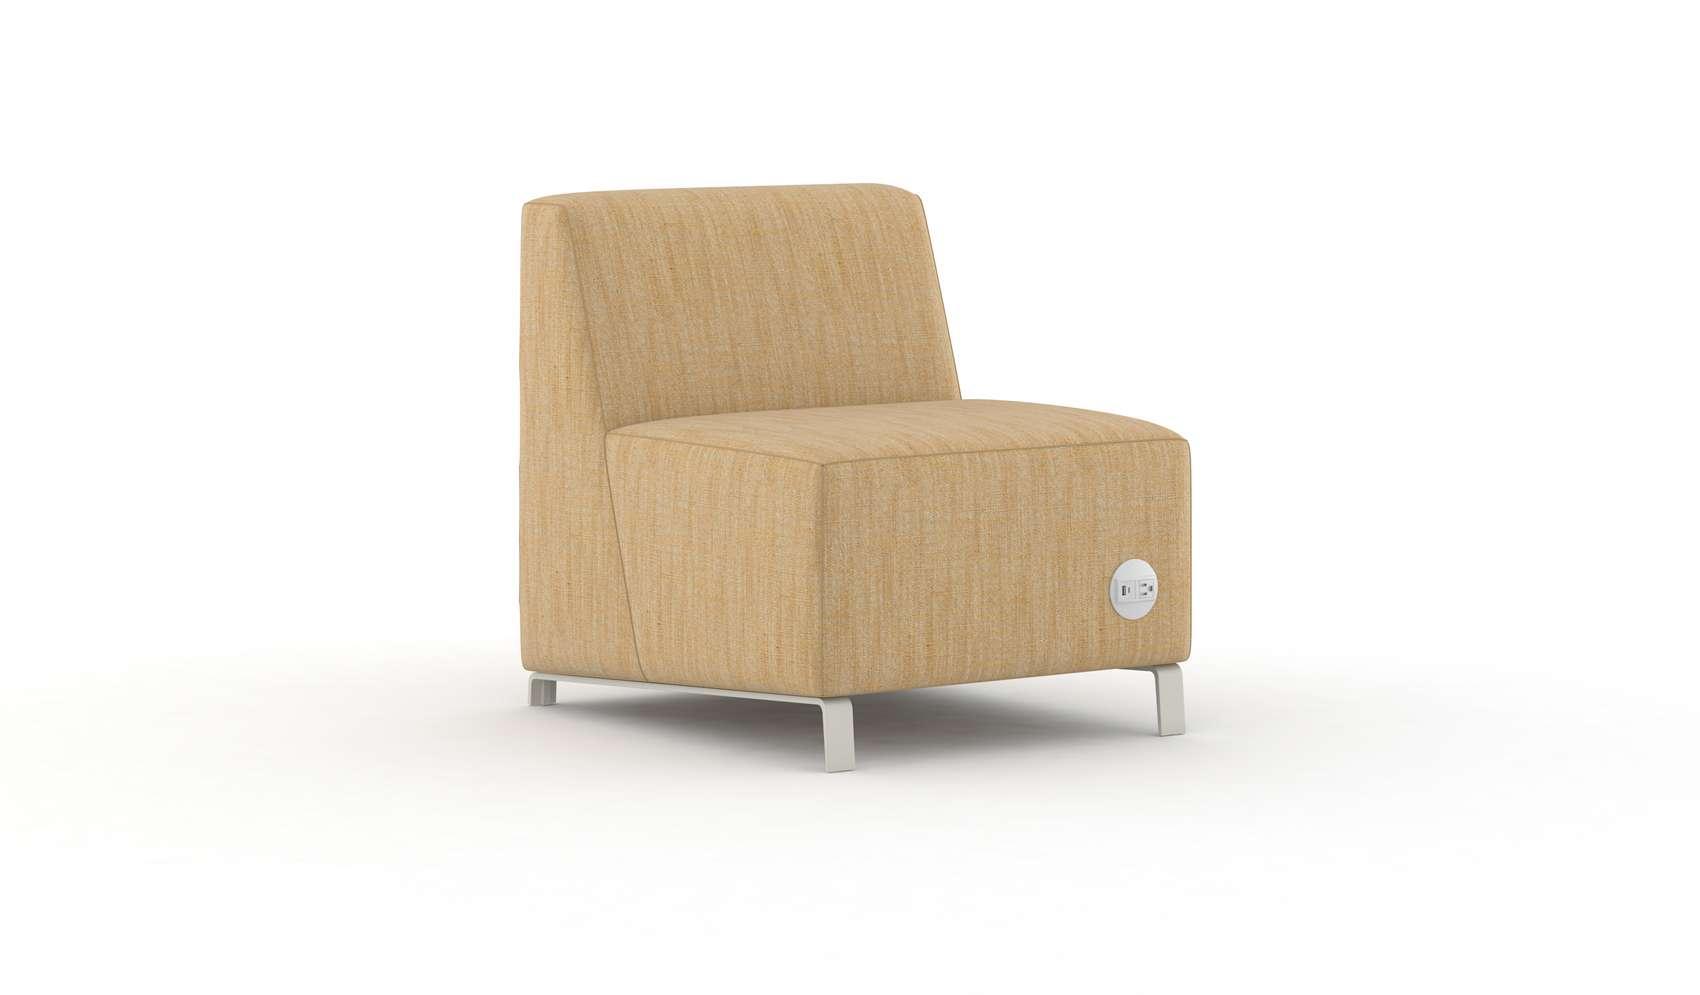 Astonishing Ofs Neom Lounge Product Dailytribune Chair Design For Home Dailytribuneorg